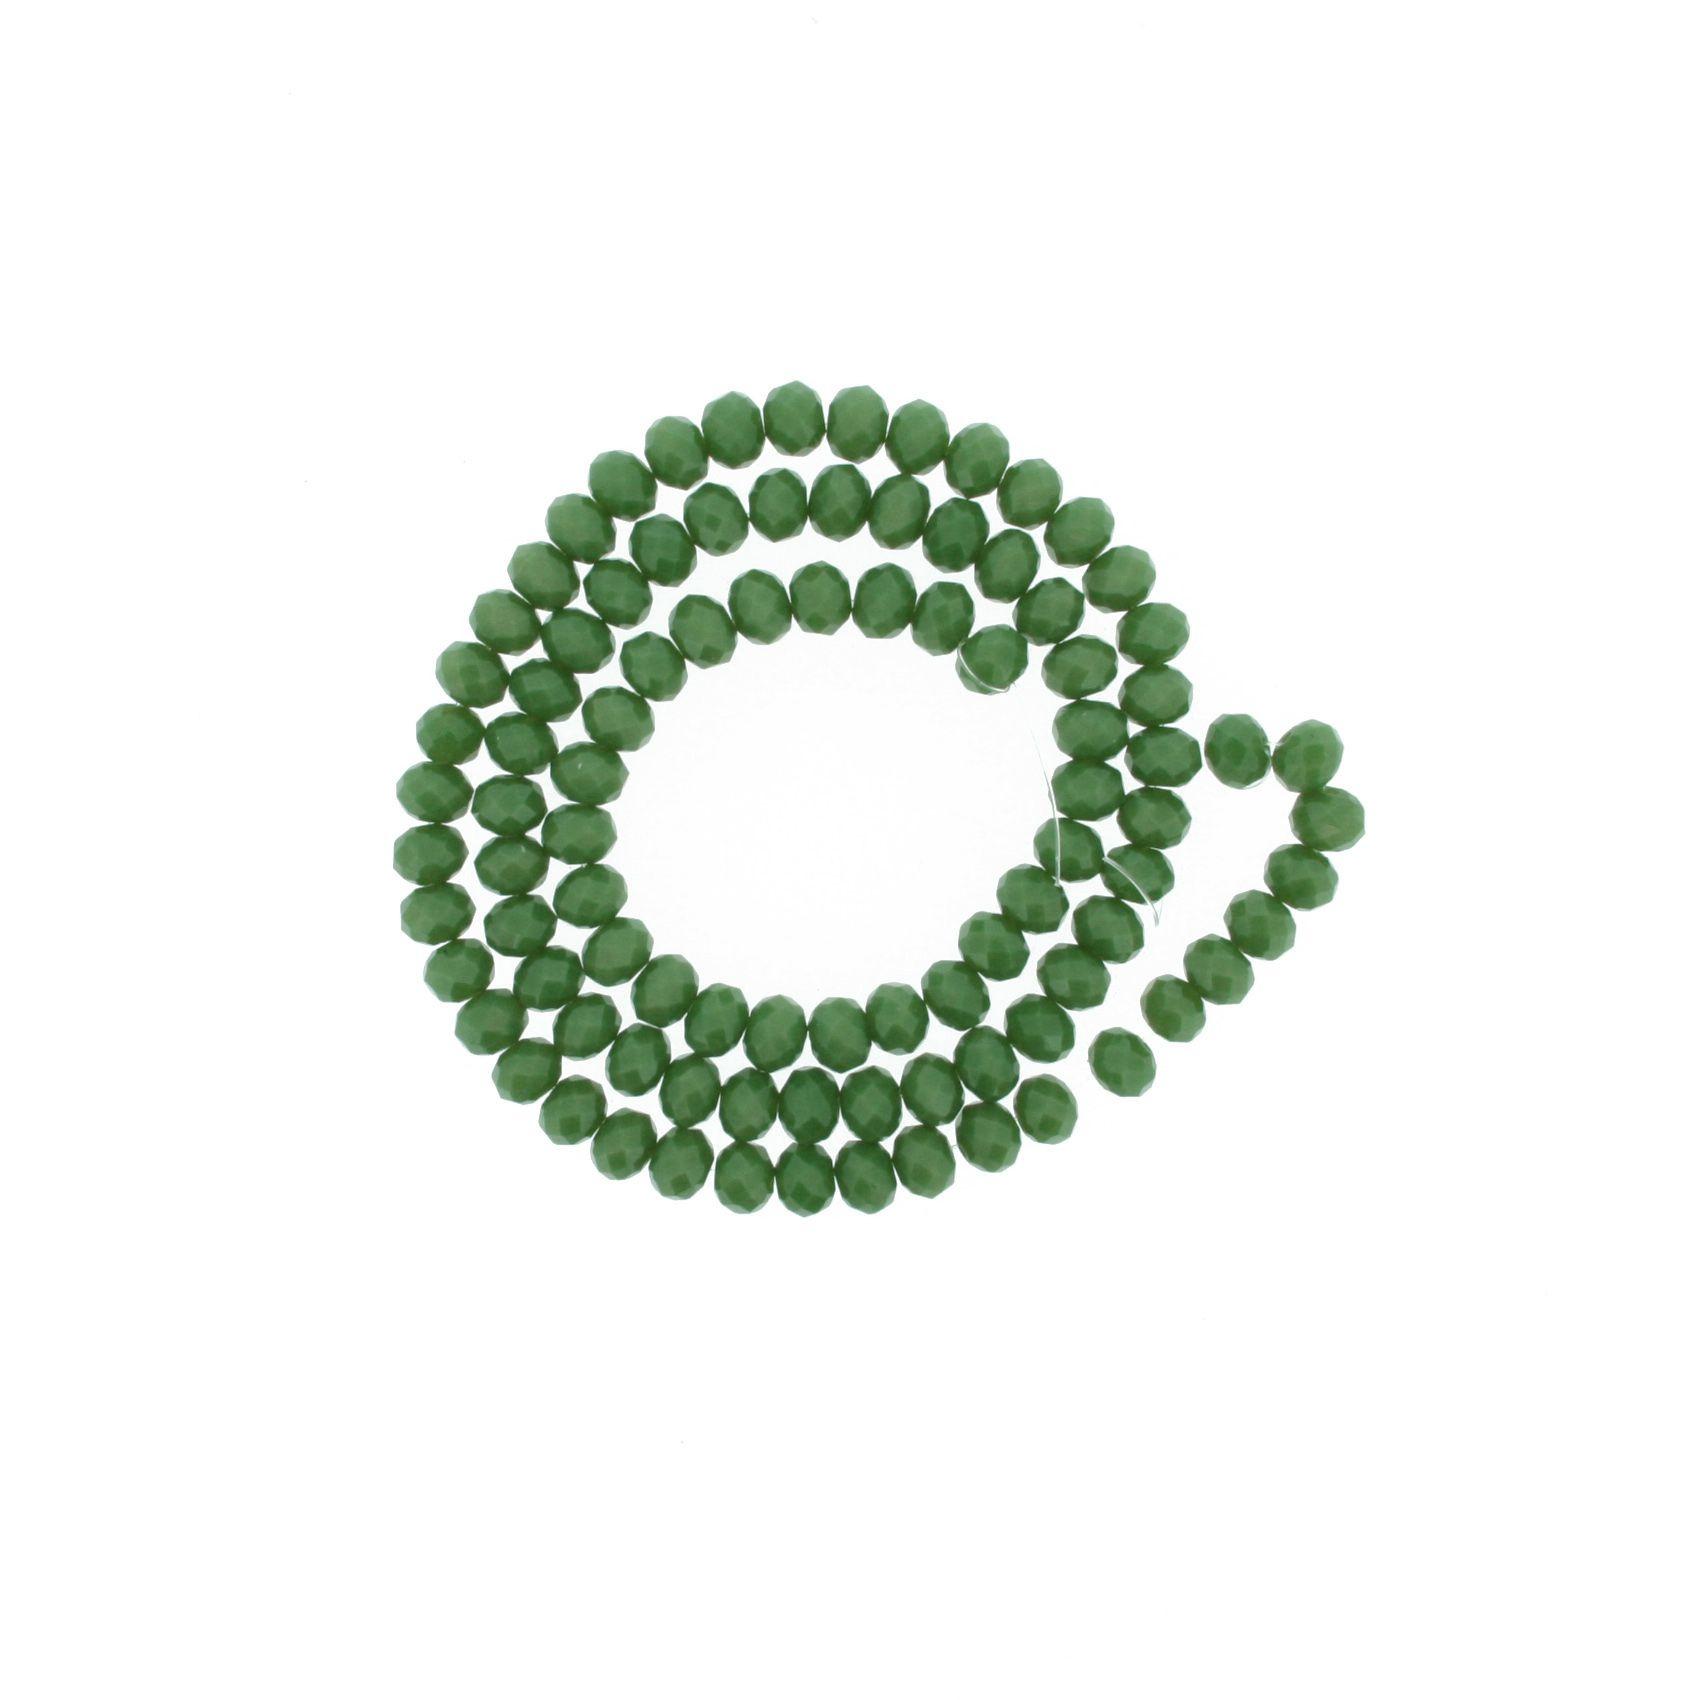 Fio de Cristal - Flat® - Verde - 6mm  - Stéphanie Bijoux® - Peças para Bijuterias e Artesanato